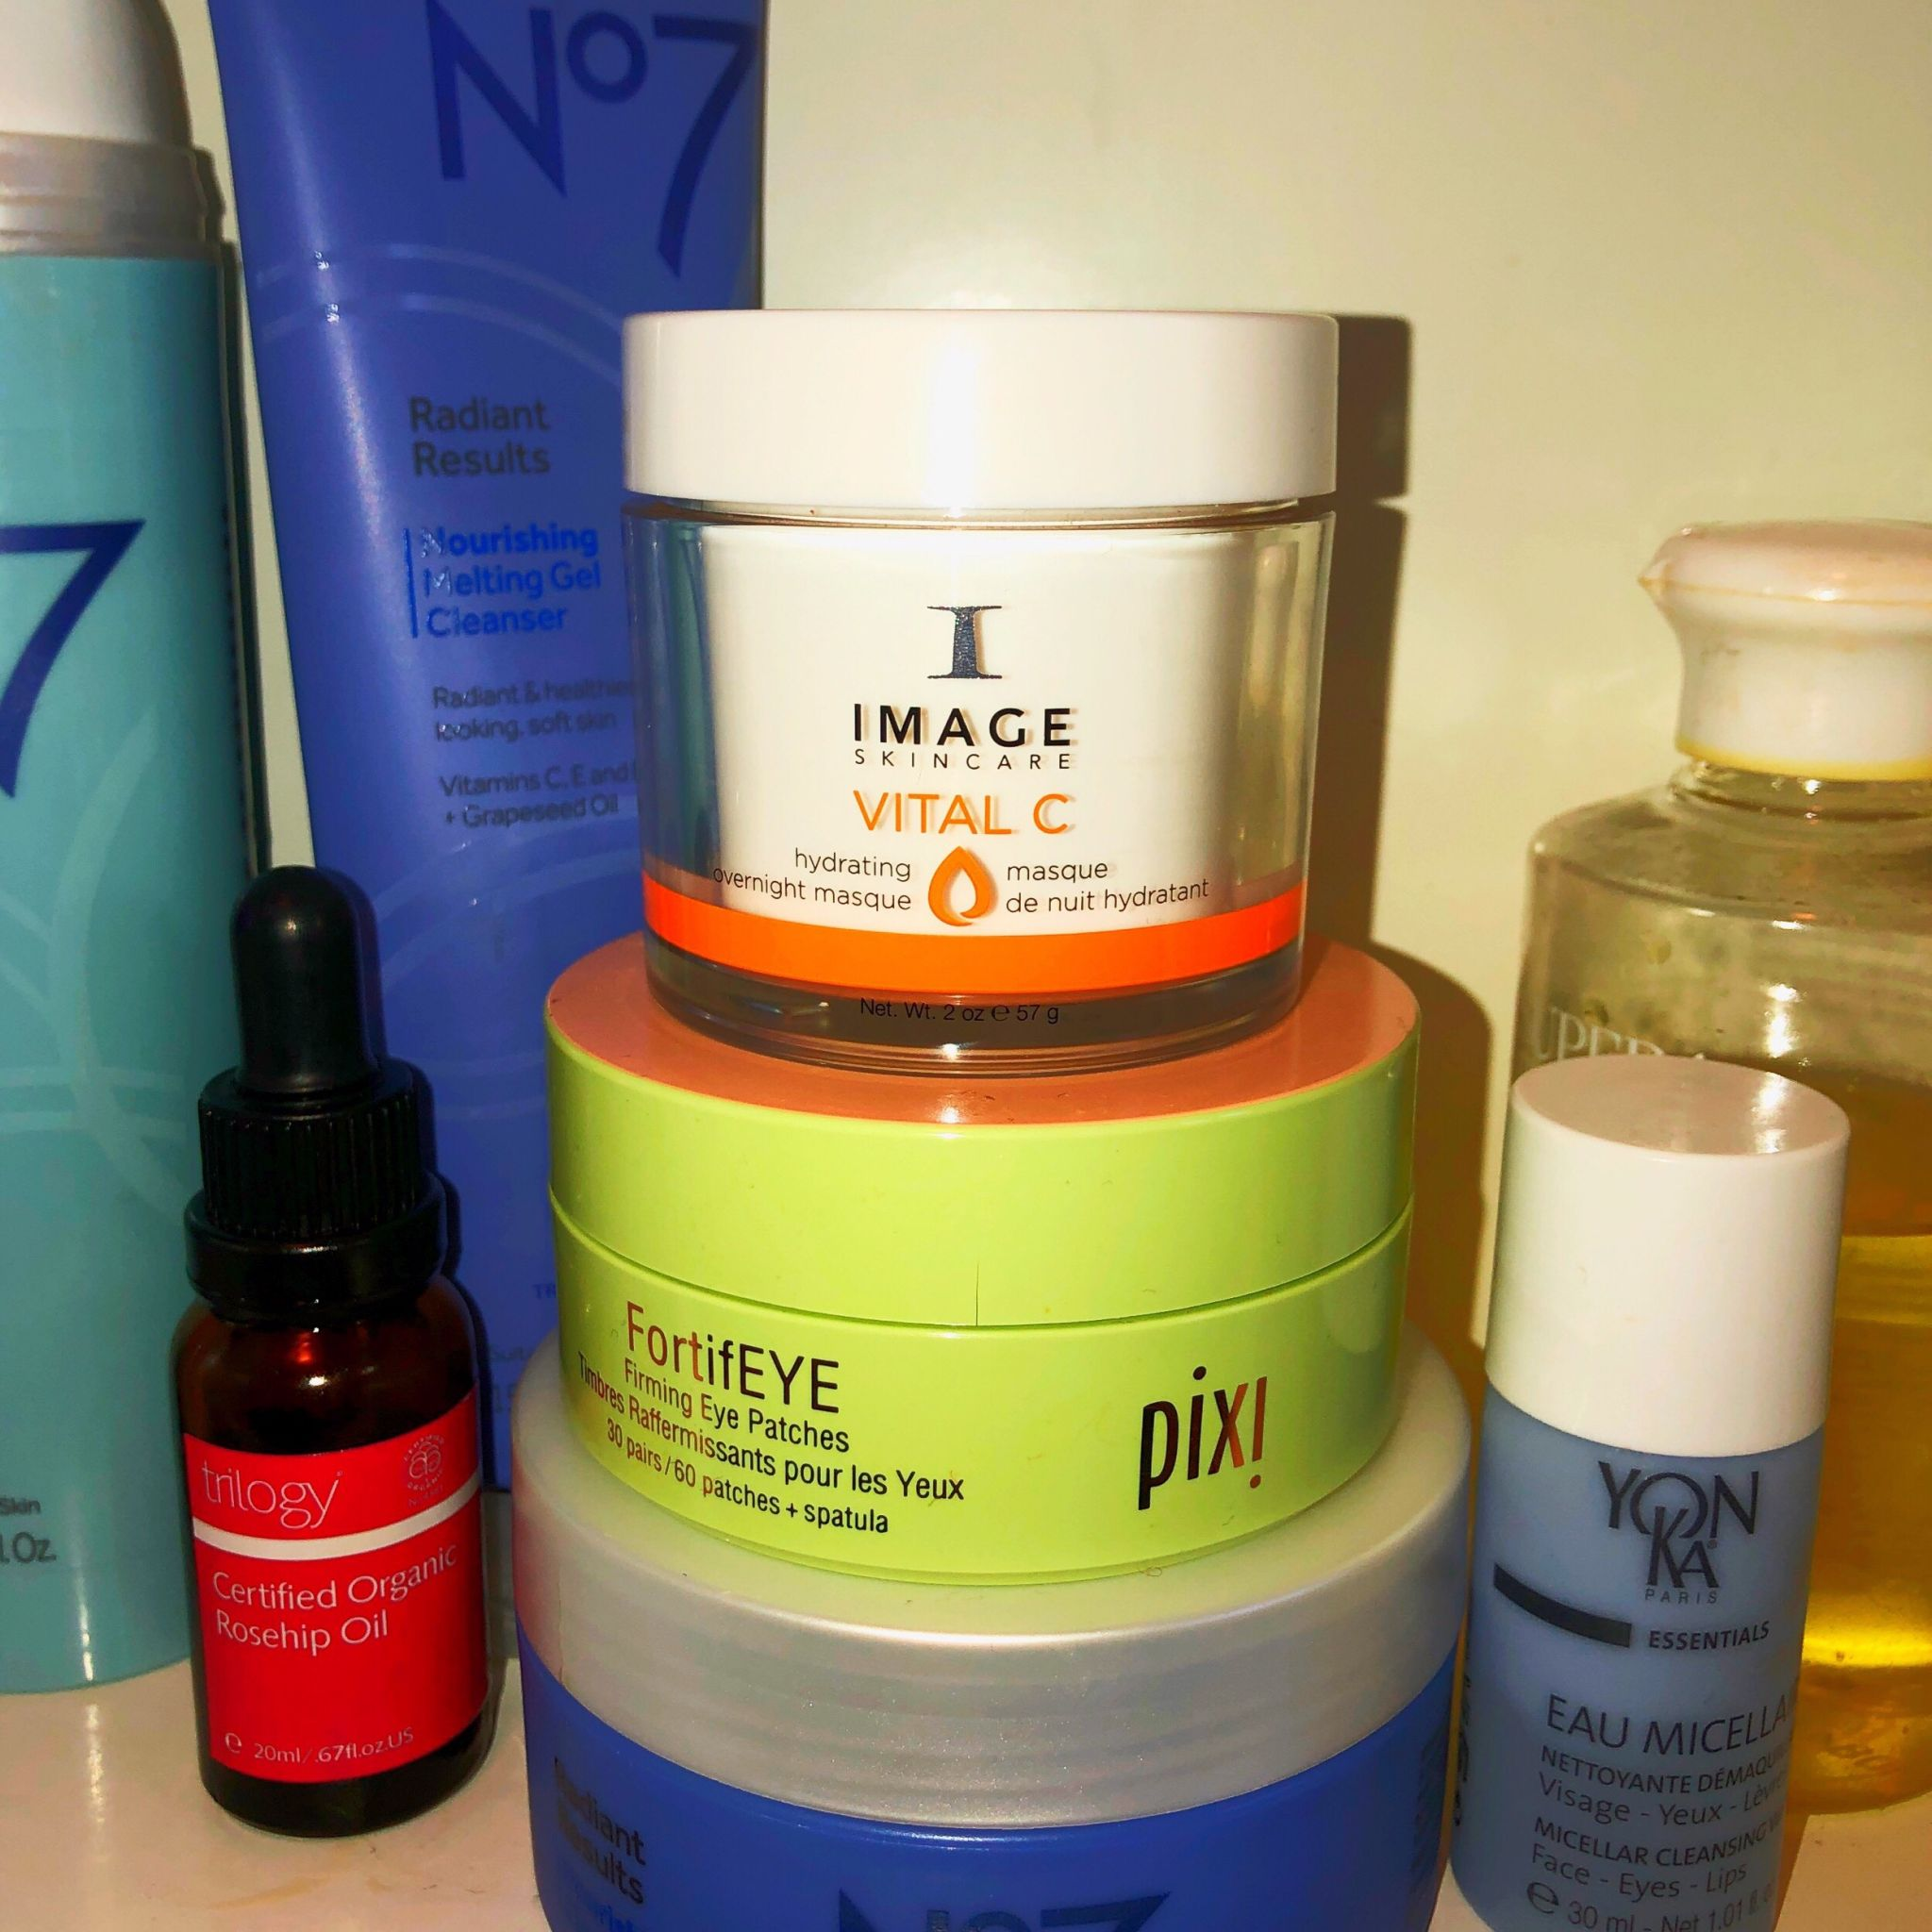 live lavishly, image skincare, moisturiser, hydration essential, vital C, trilogy rosehip oil, pix, yonka